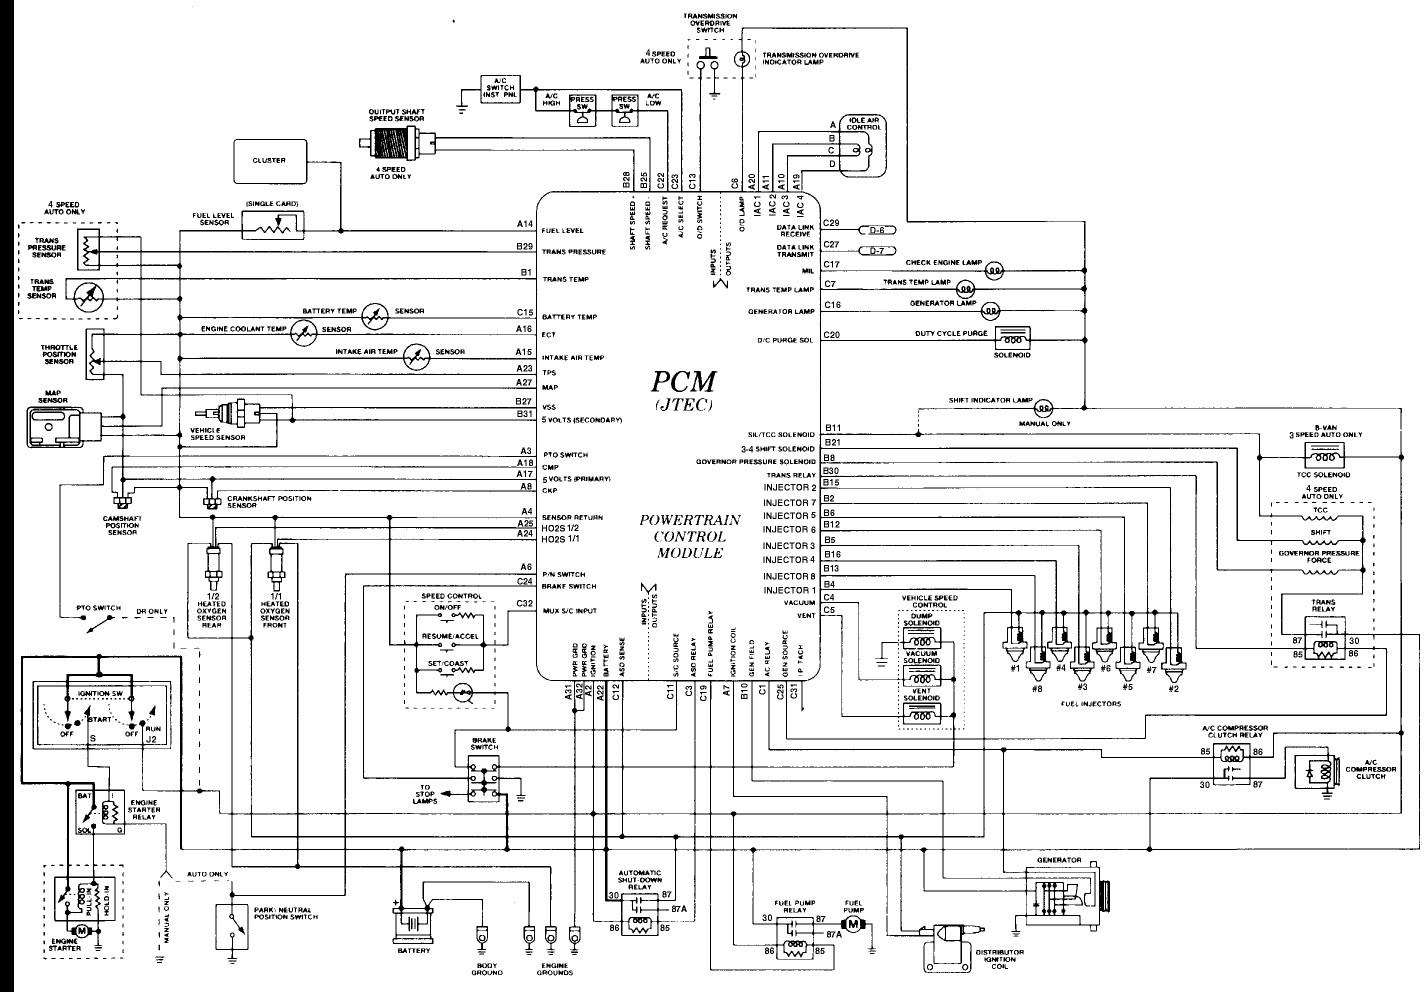 Dodge Ram 1500 Wiring Diagram Free | Free Wiring Diagram on 85 dodge ramcharger wiring diagram, 84 dodge ram wiring diagram, 85 dodge ram power, 85 dodge ram accessories, 85 dodge ram exhaust system,